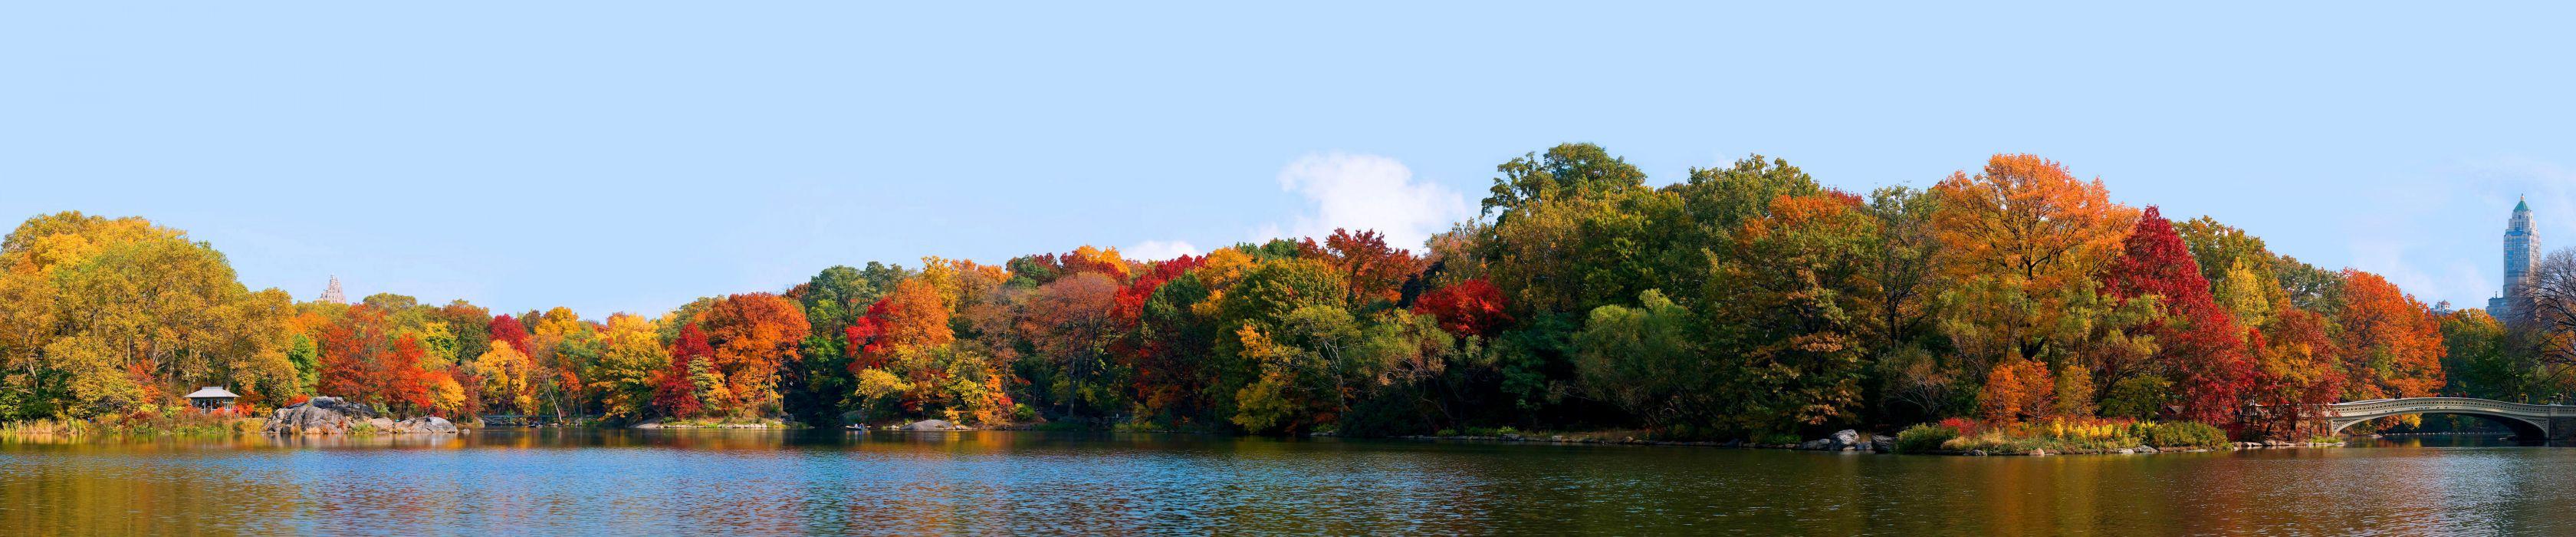 New York Central Park Manhattan Autumn lake    f wallpaper